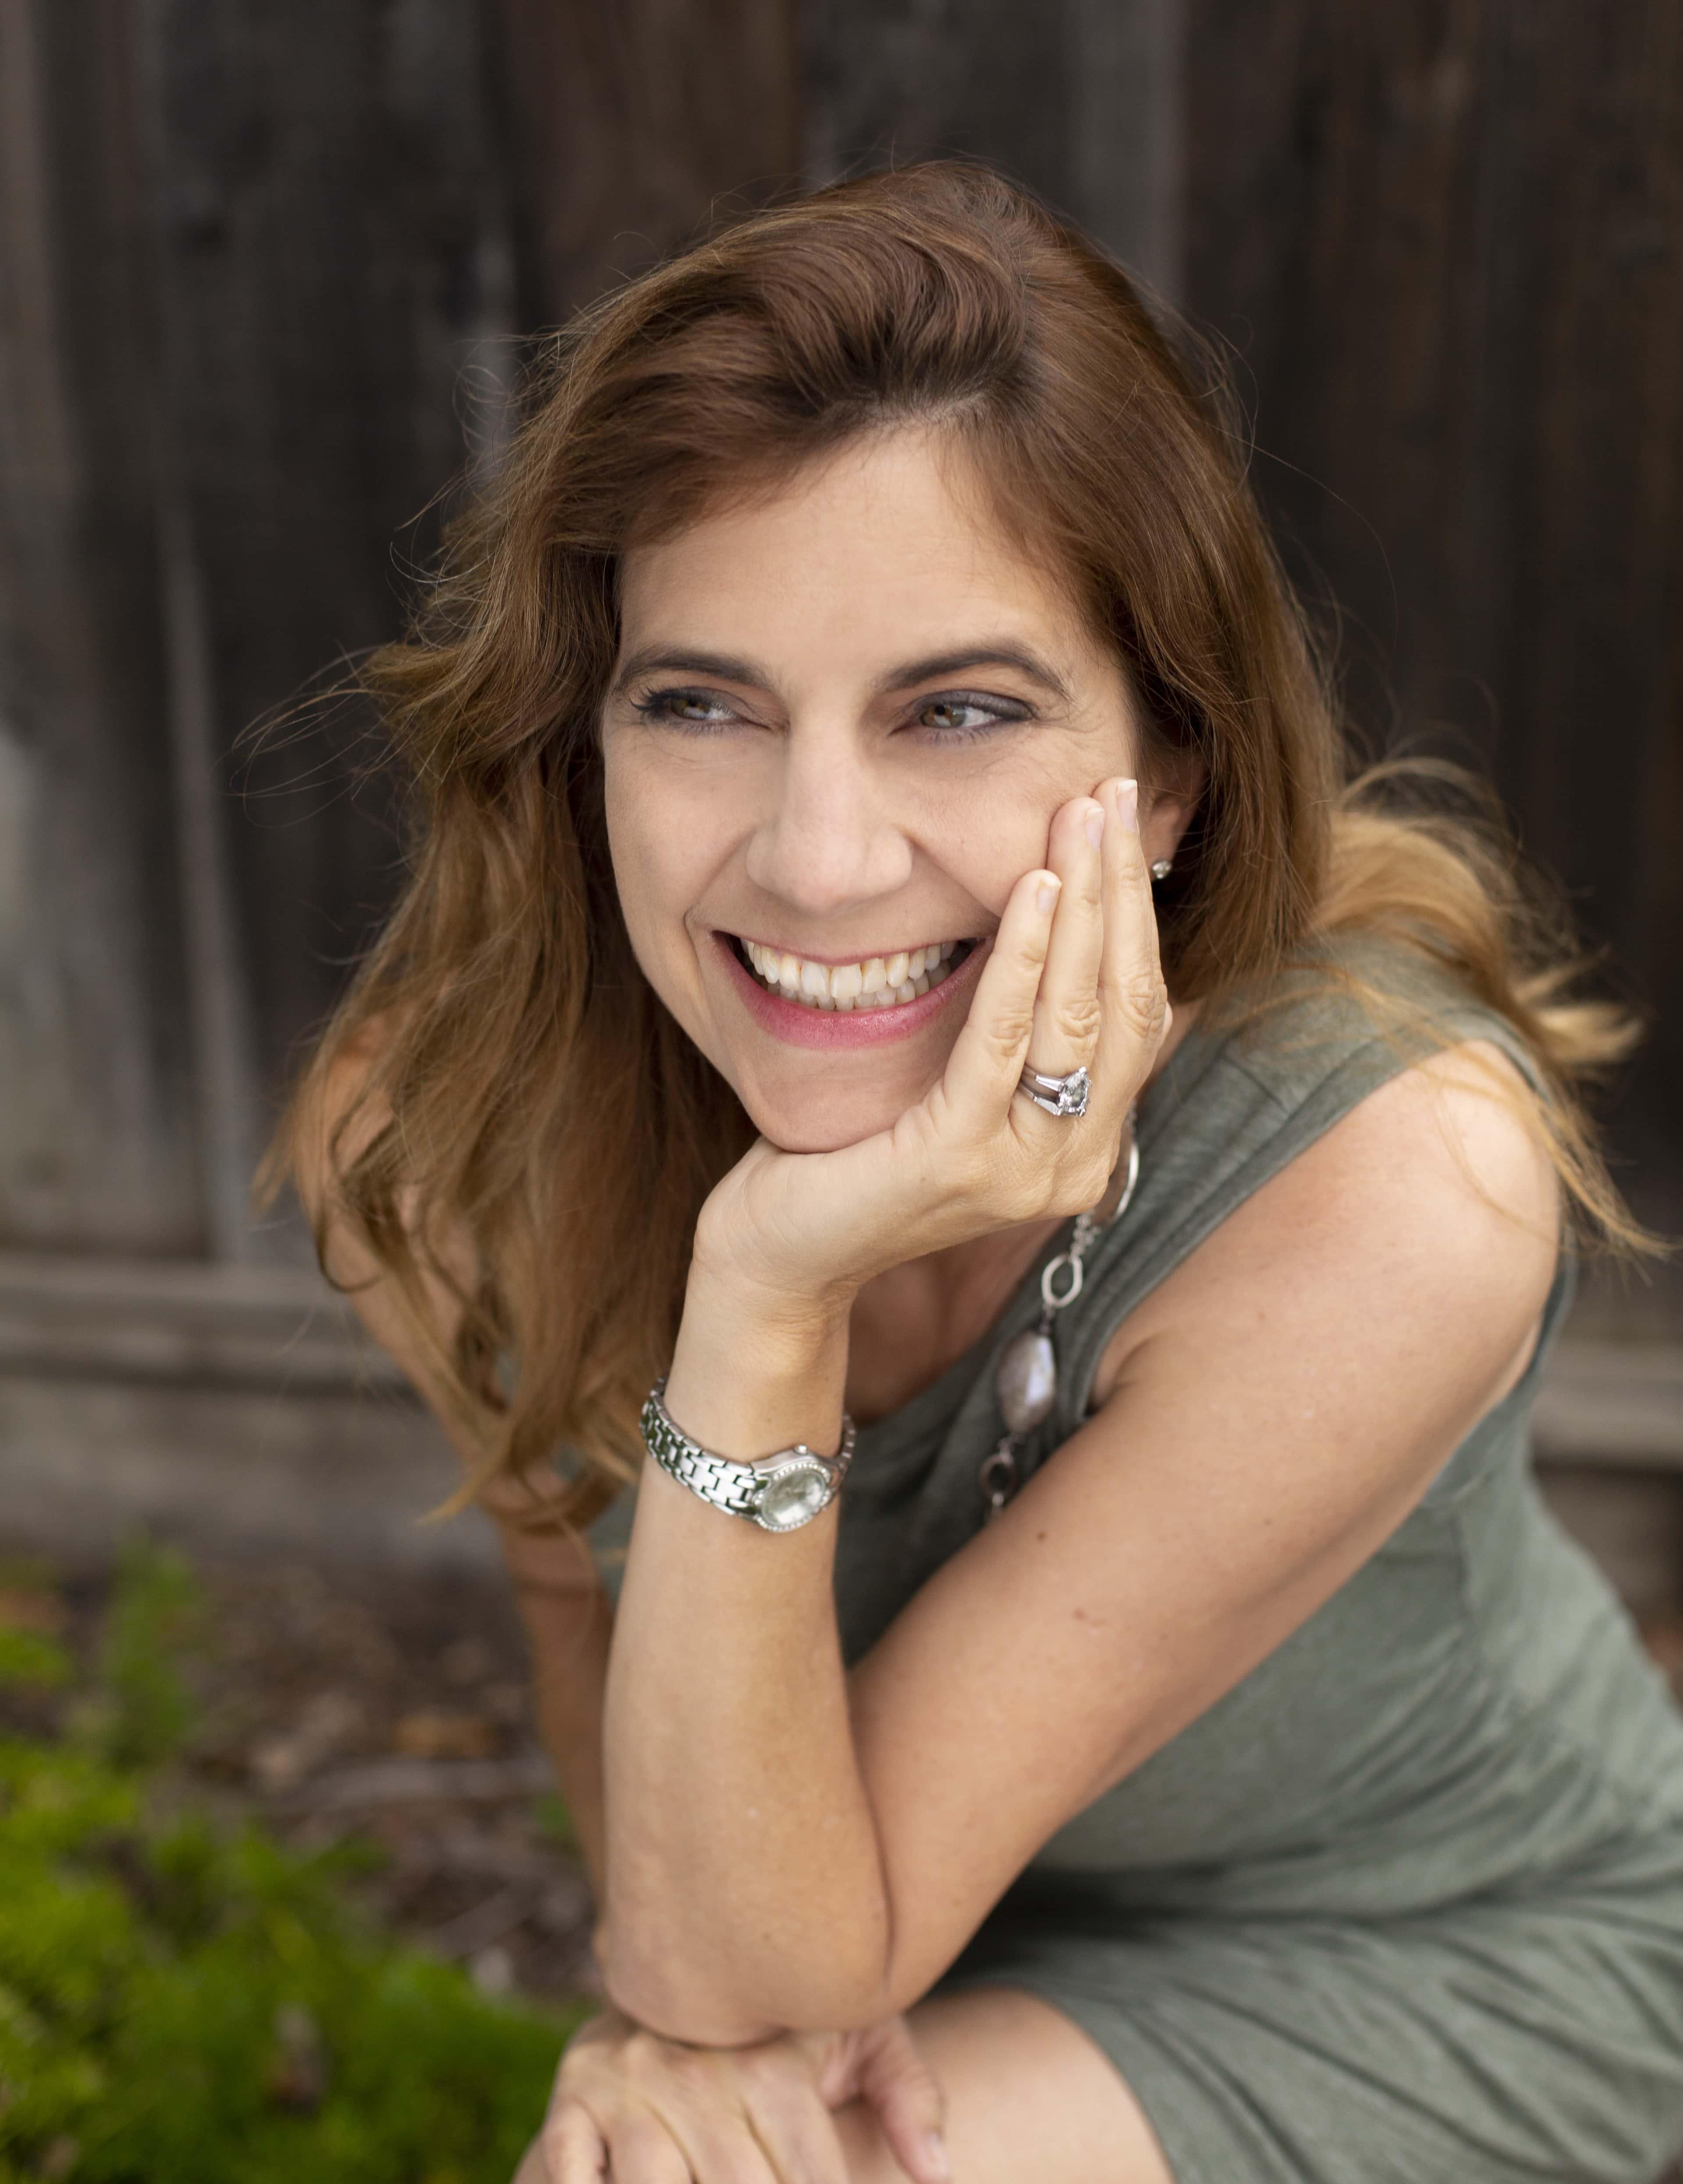 Life Coach for Parents | Torie Henderson